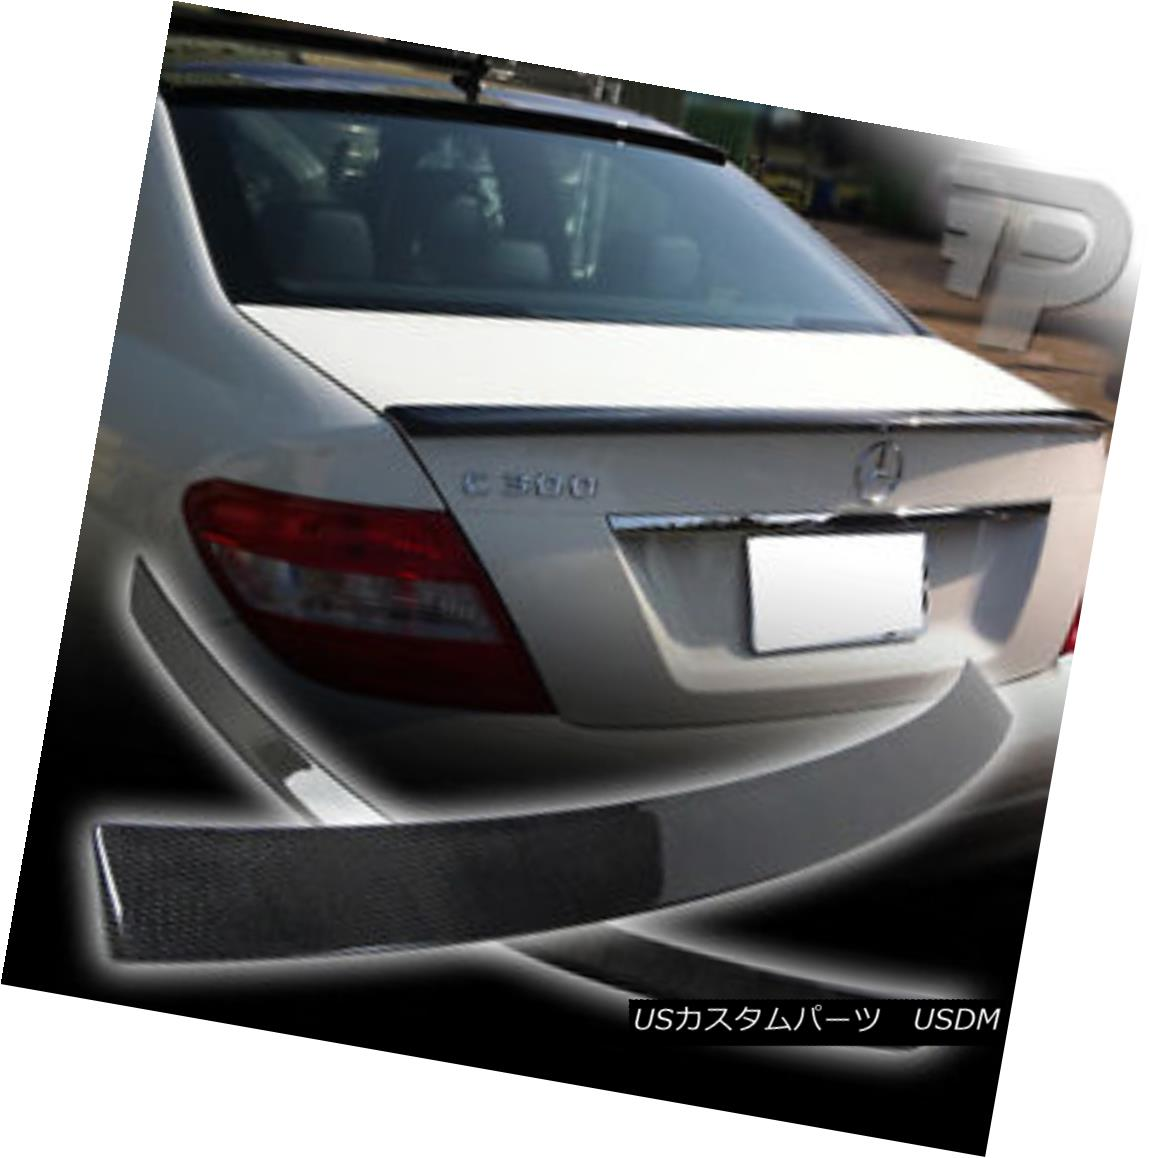 ▼ COMBO エアロパーツ SPOILER OE C300 REAR OEルーフ+リアスポイラートランクC300 + A カーボンファイバーコンボメルセデスベンツW204 ROOF C63? Mercedes TRUNK BENZ FIBER CARBON C63 W204